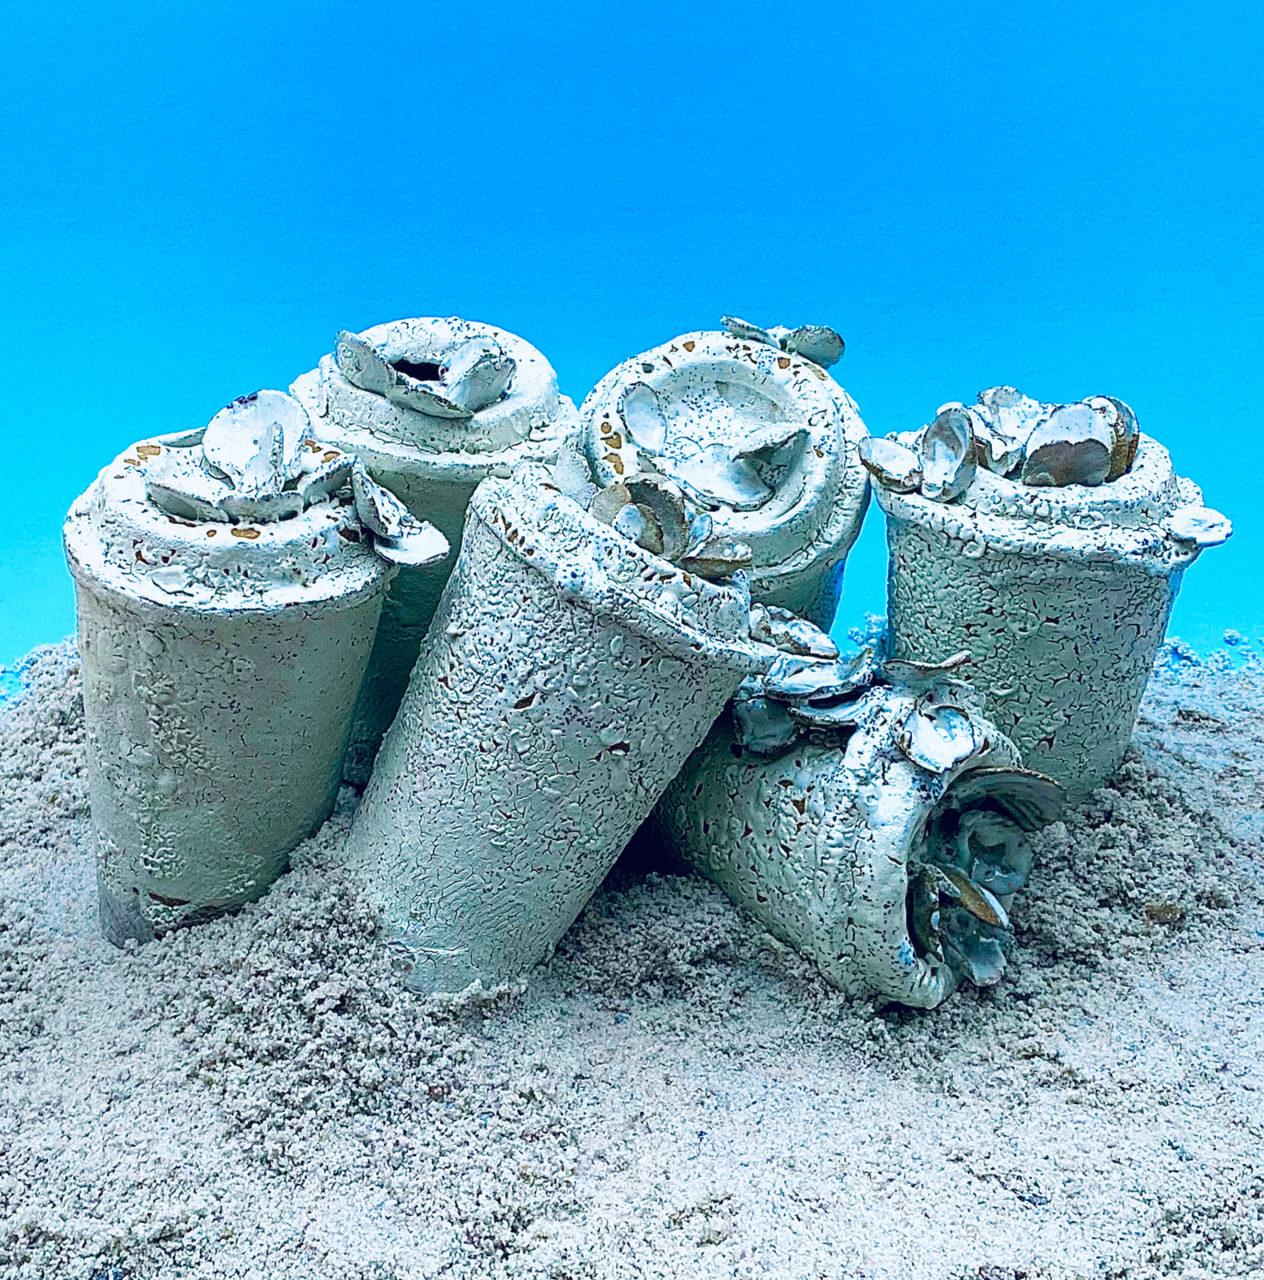 Anthropocene Vessels - Stephen J. Washington